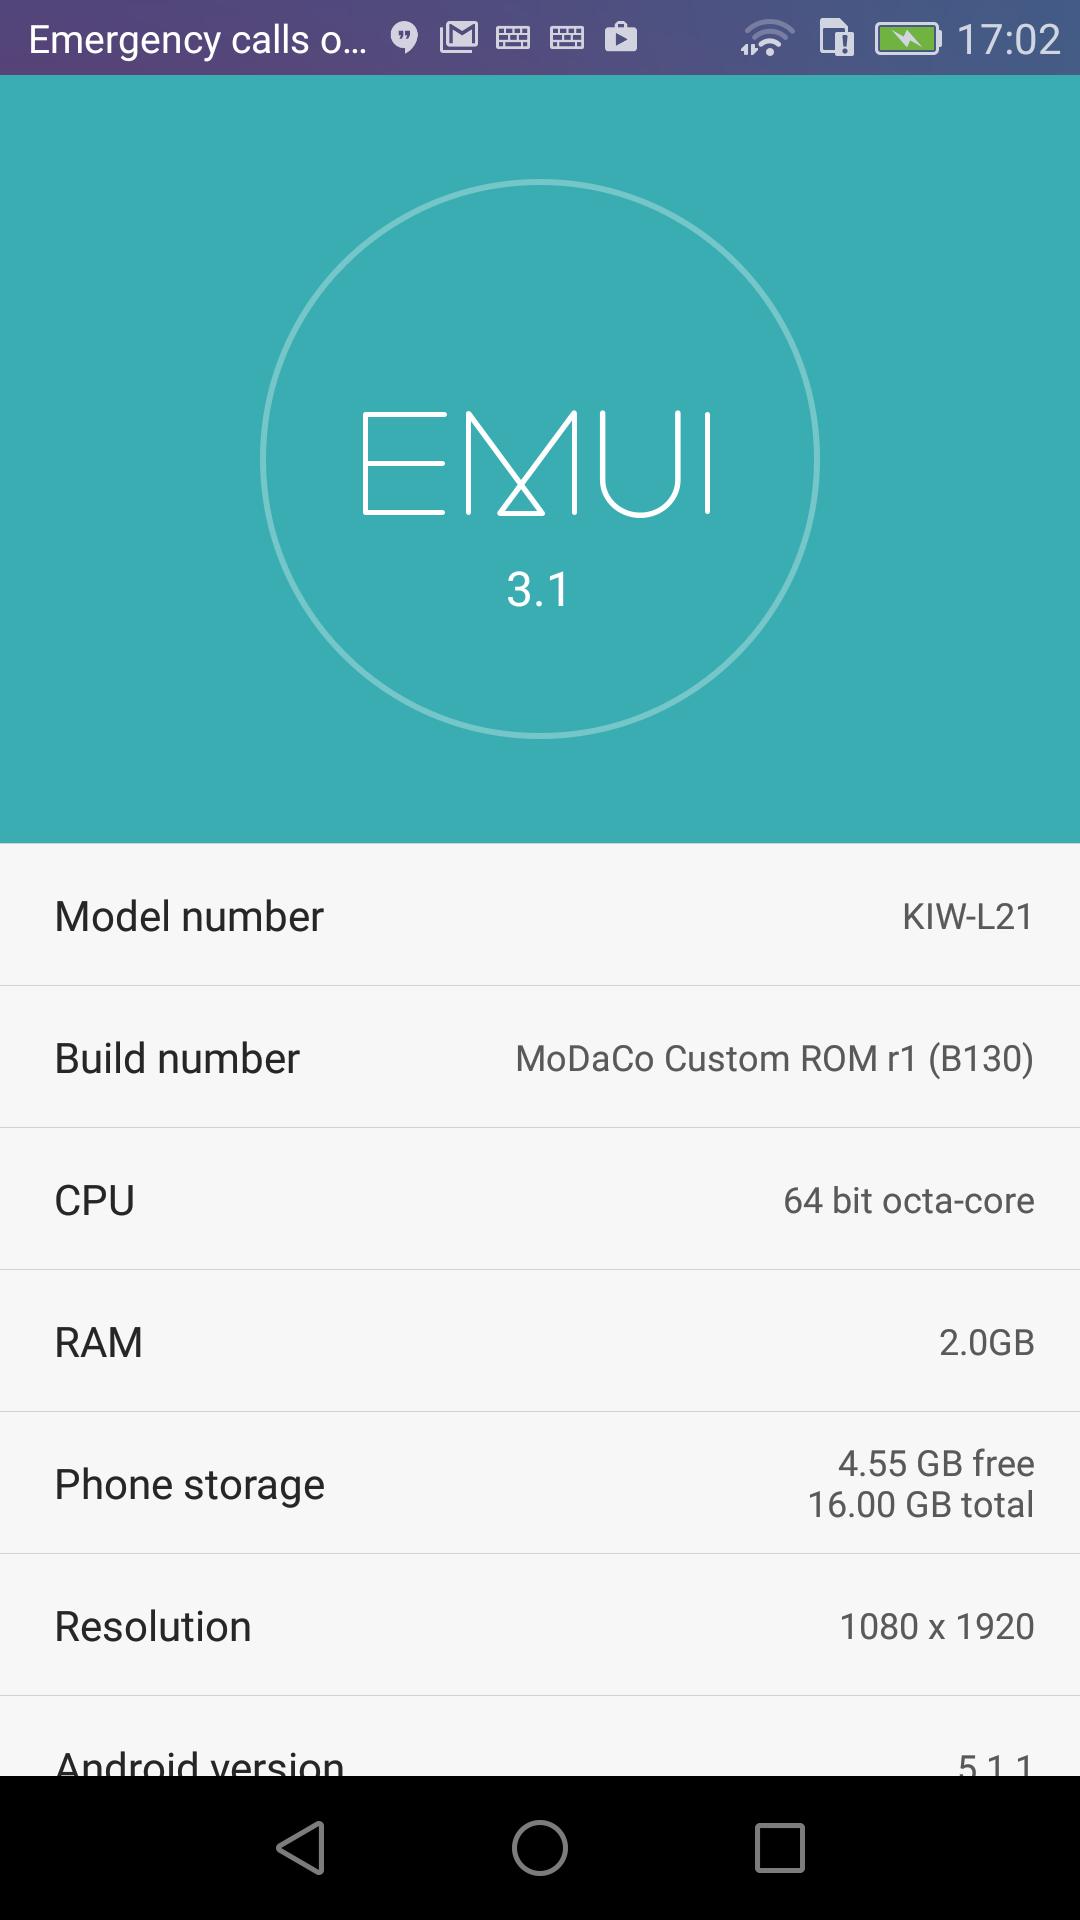 r7 - MoDaCo Custom ROM [EMUI style] - Honor 5X KIW-L21